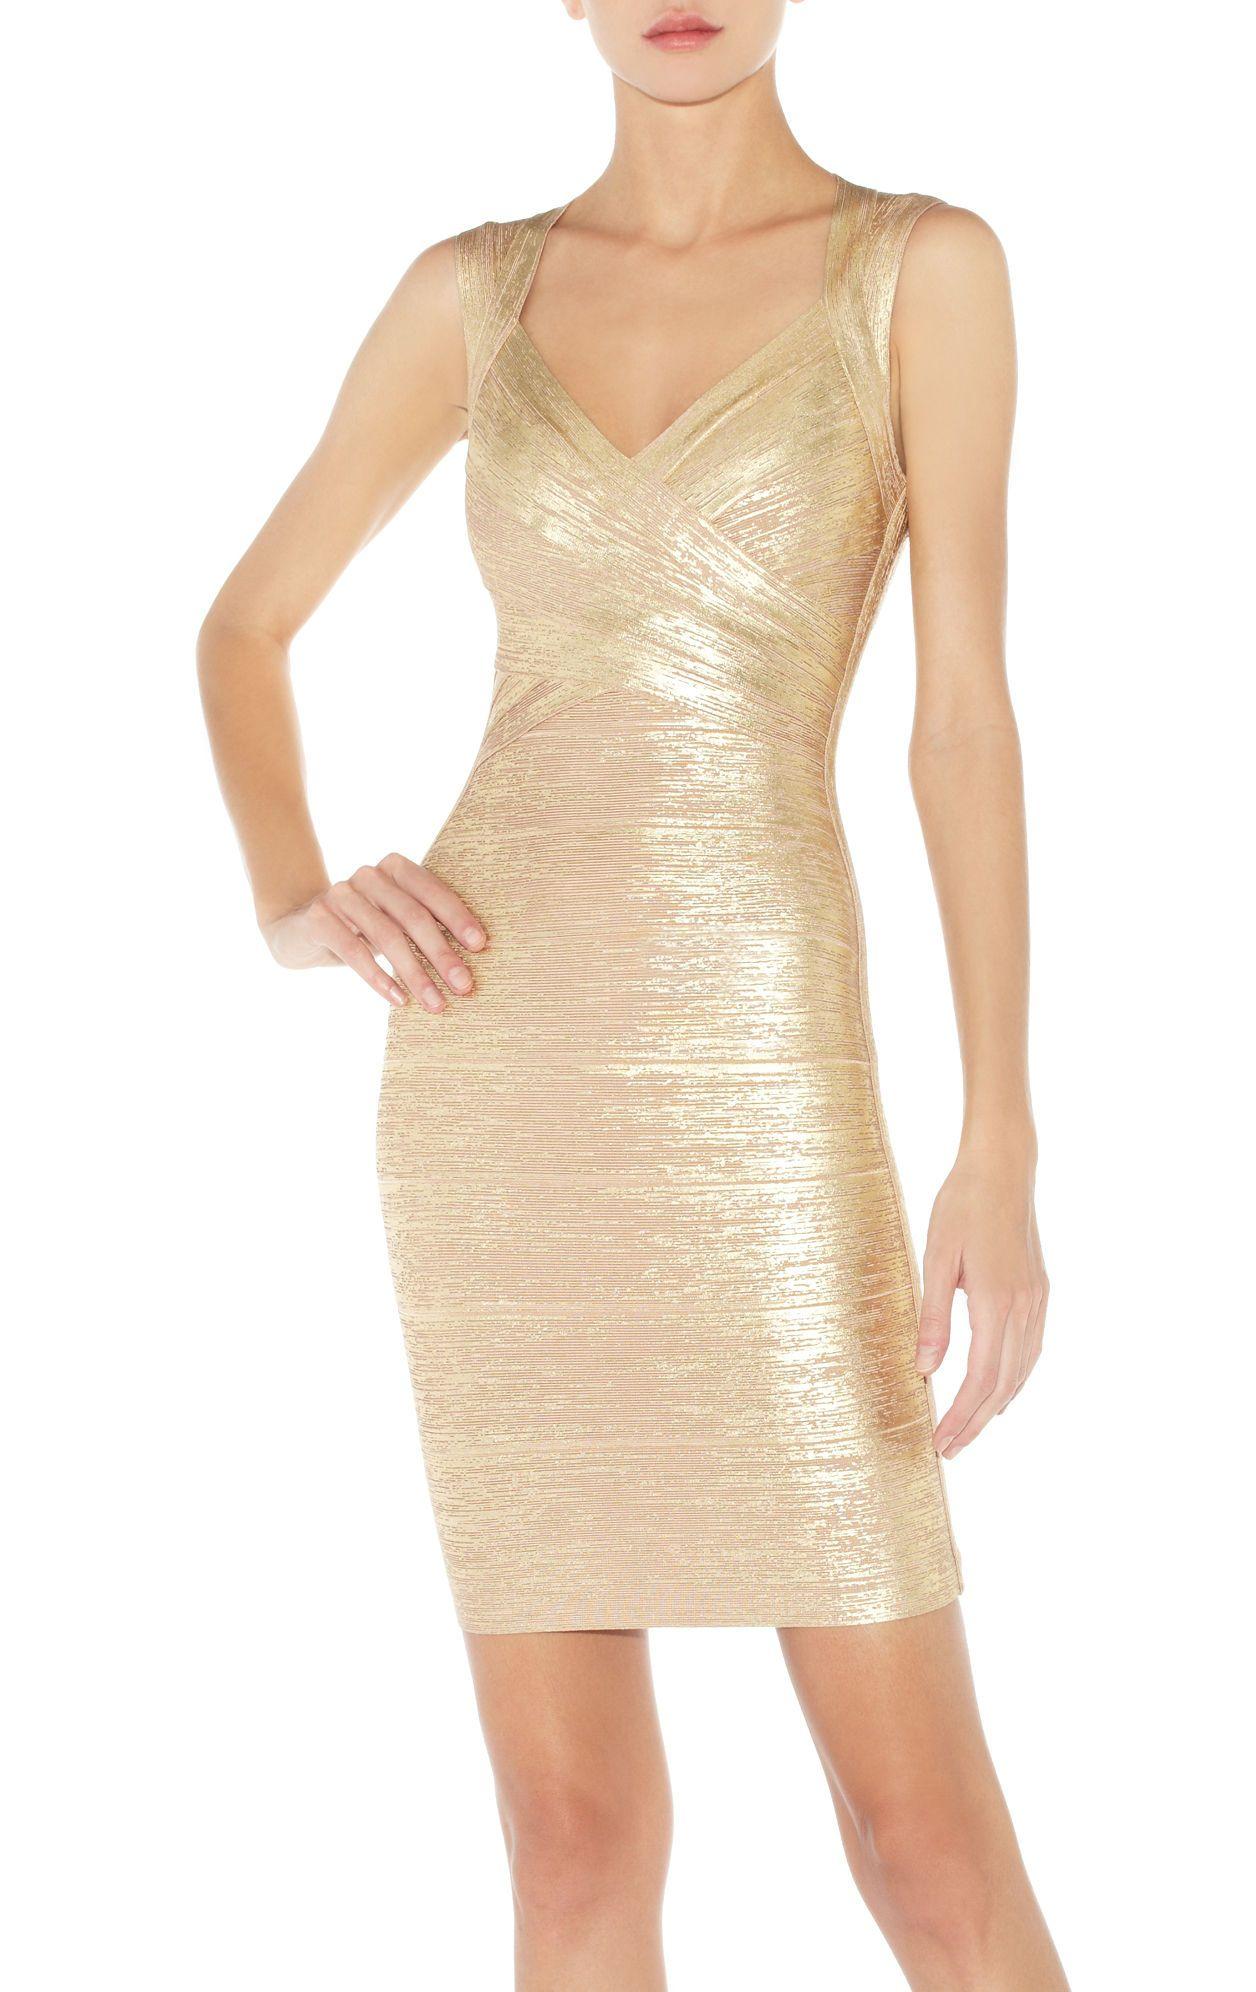 Babe In A Bandage Dress Dresses Womens Dresses Bodycon Dress [ 2247 x 1500 Pixel ]